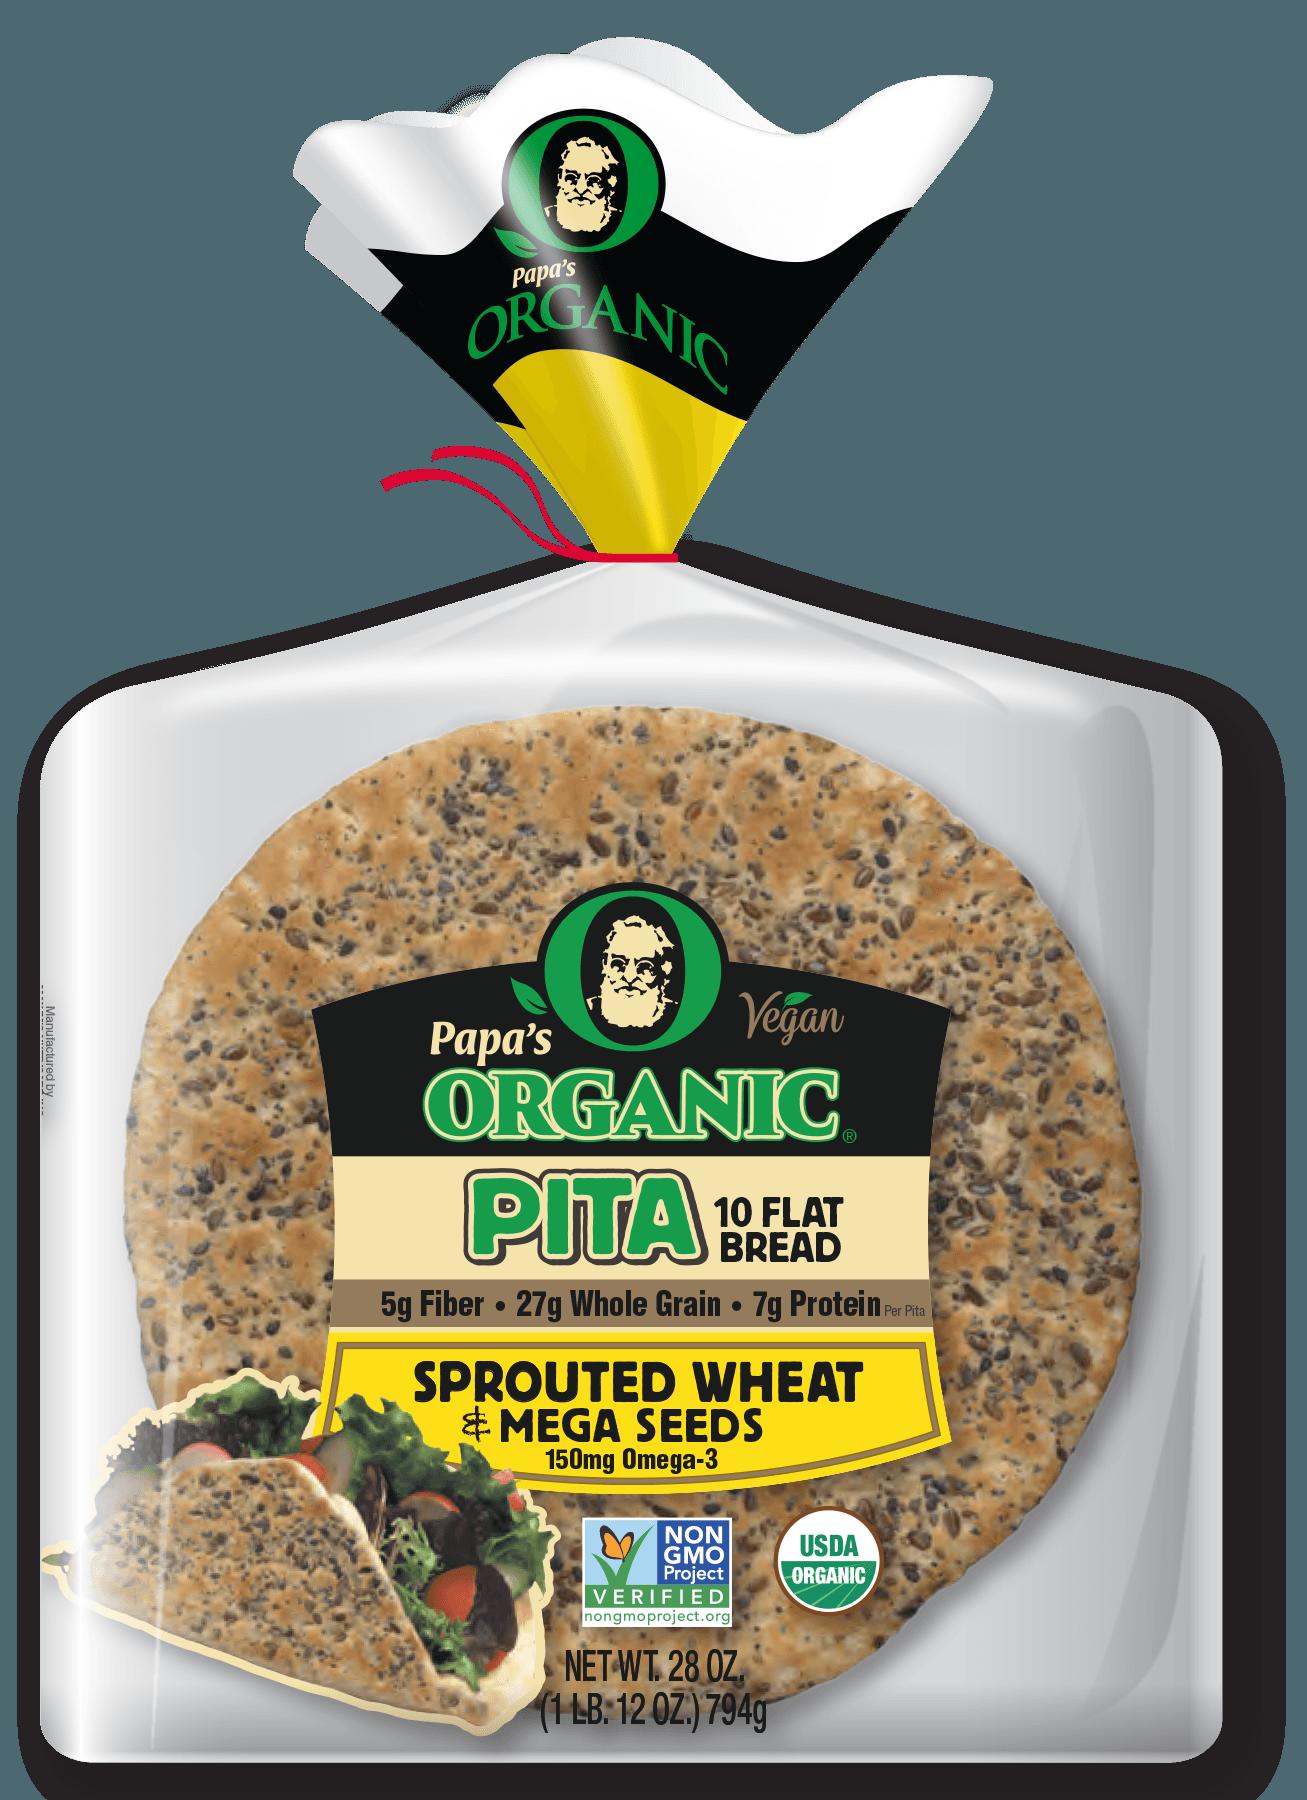 Papa's Organic Sprouted Wheat Pitas 10 CT